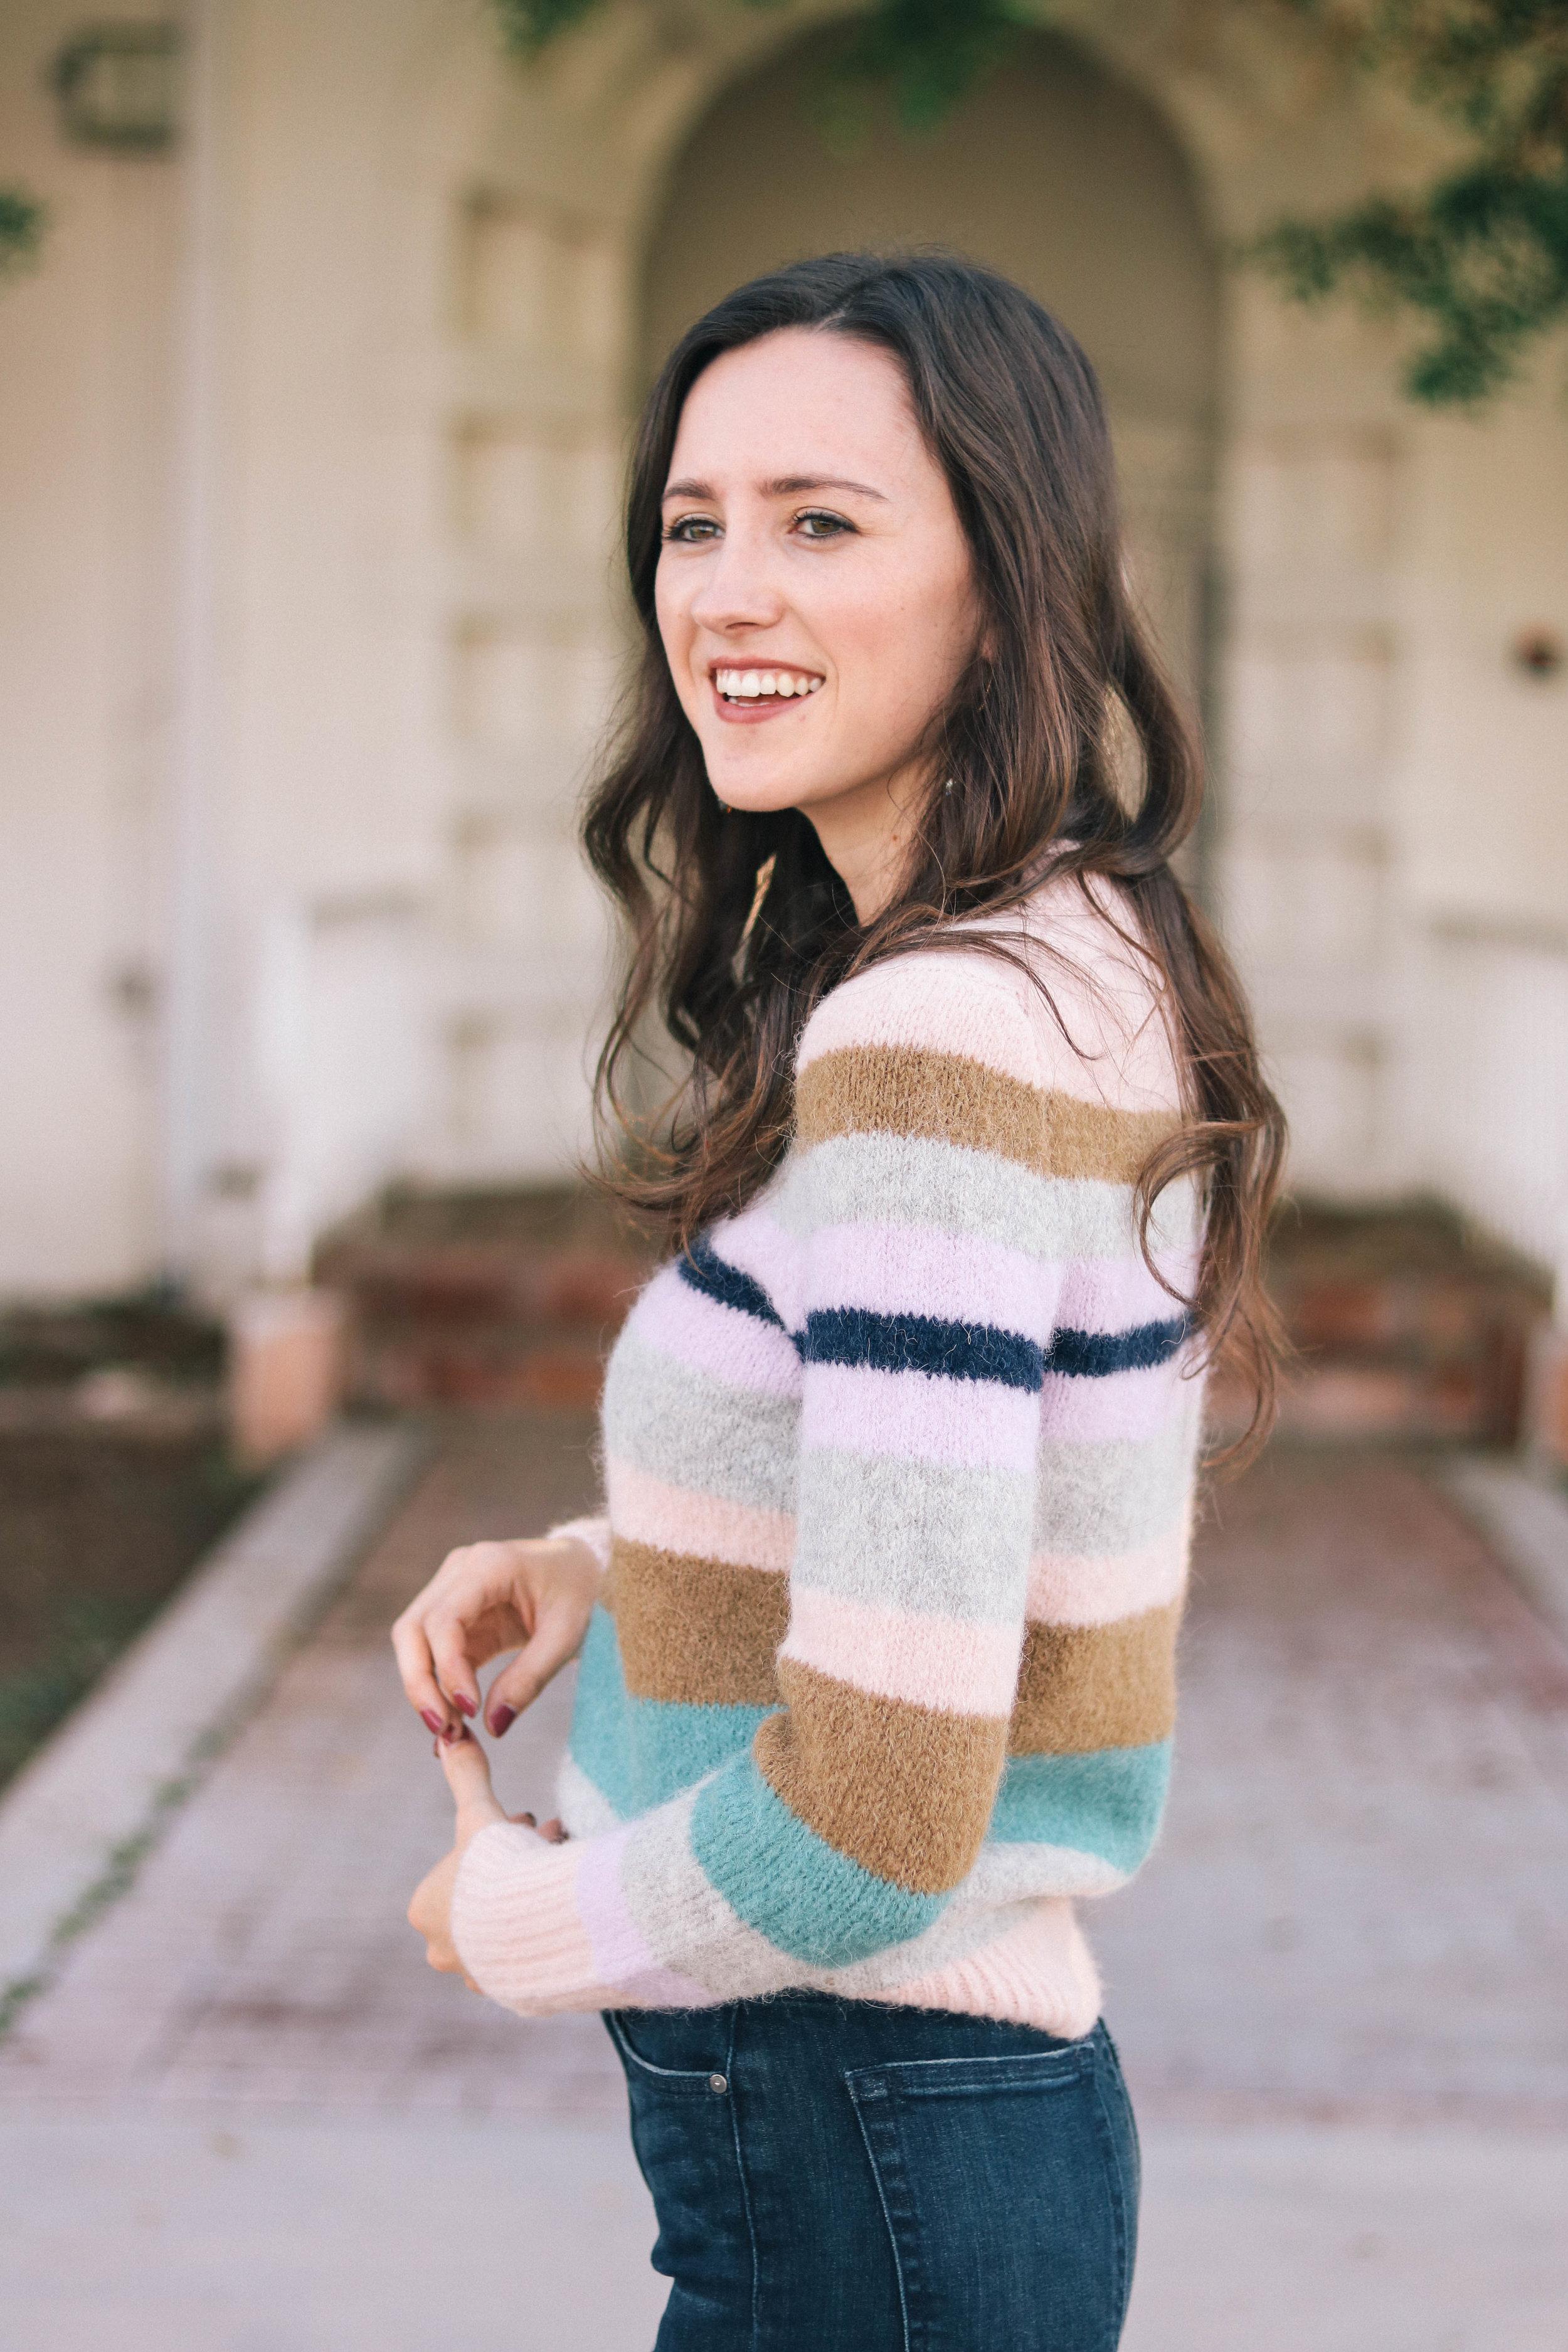 bb-striped-sweater-009 (1 of 1).jpg